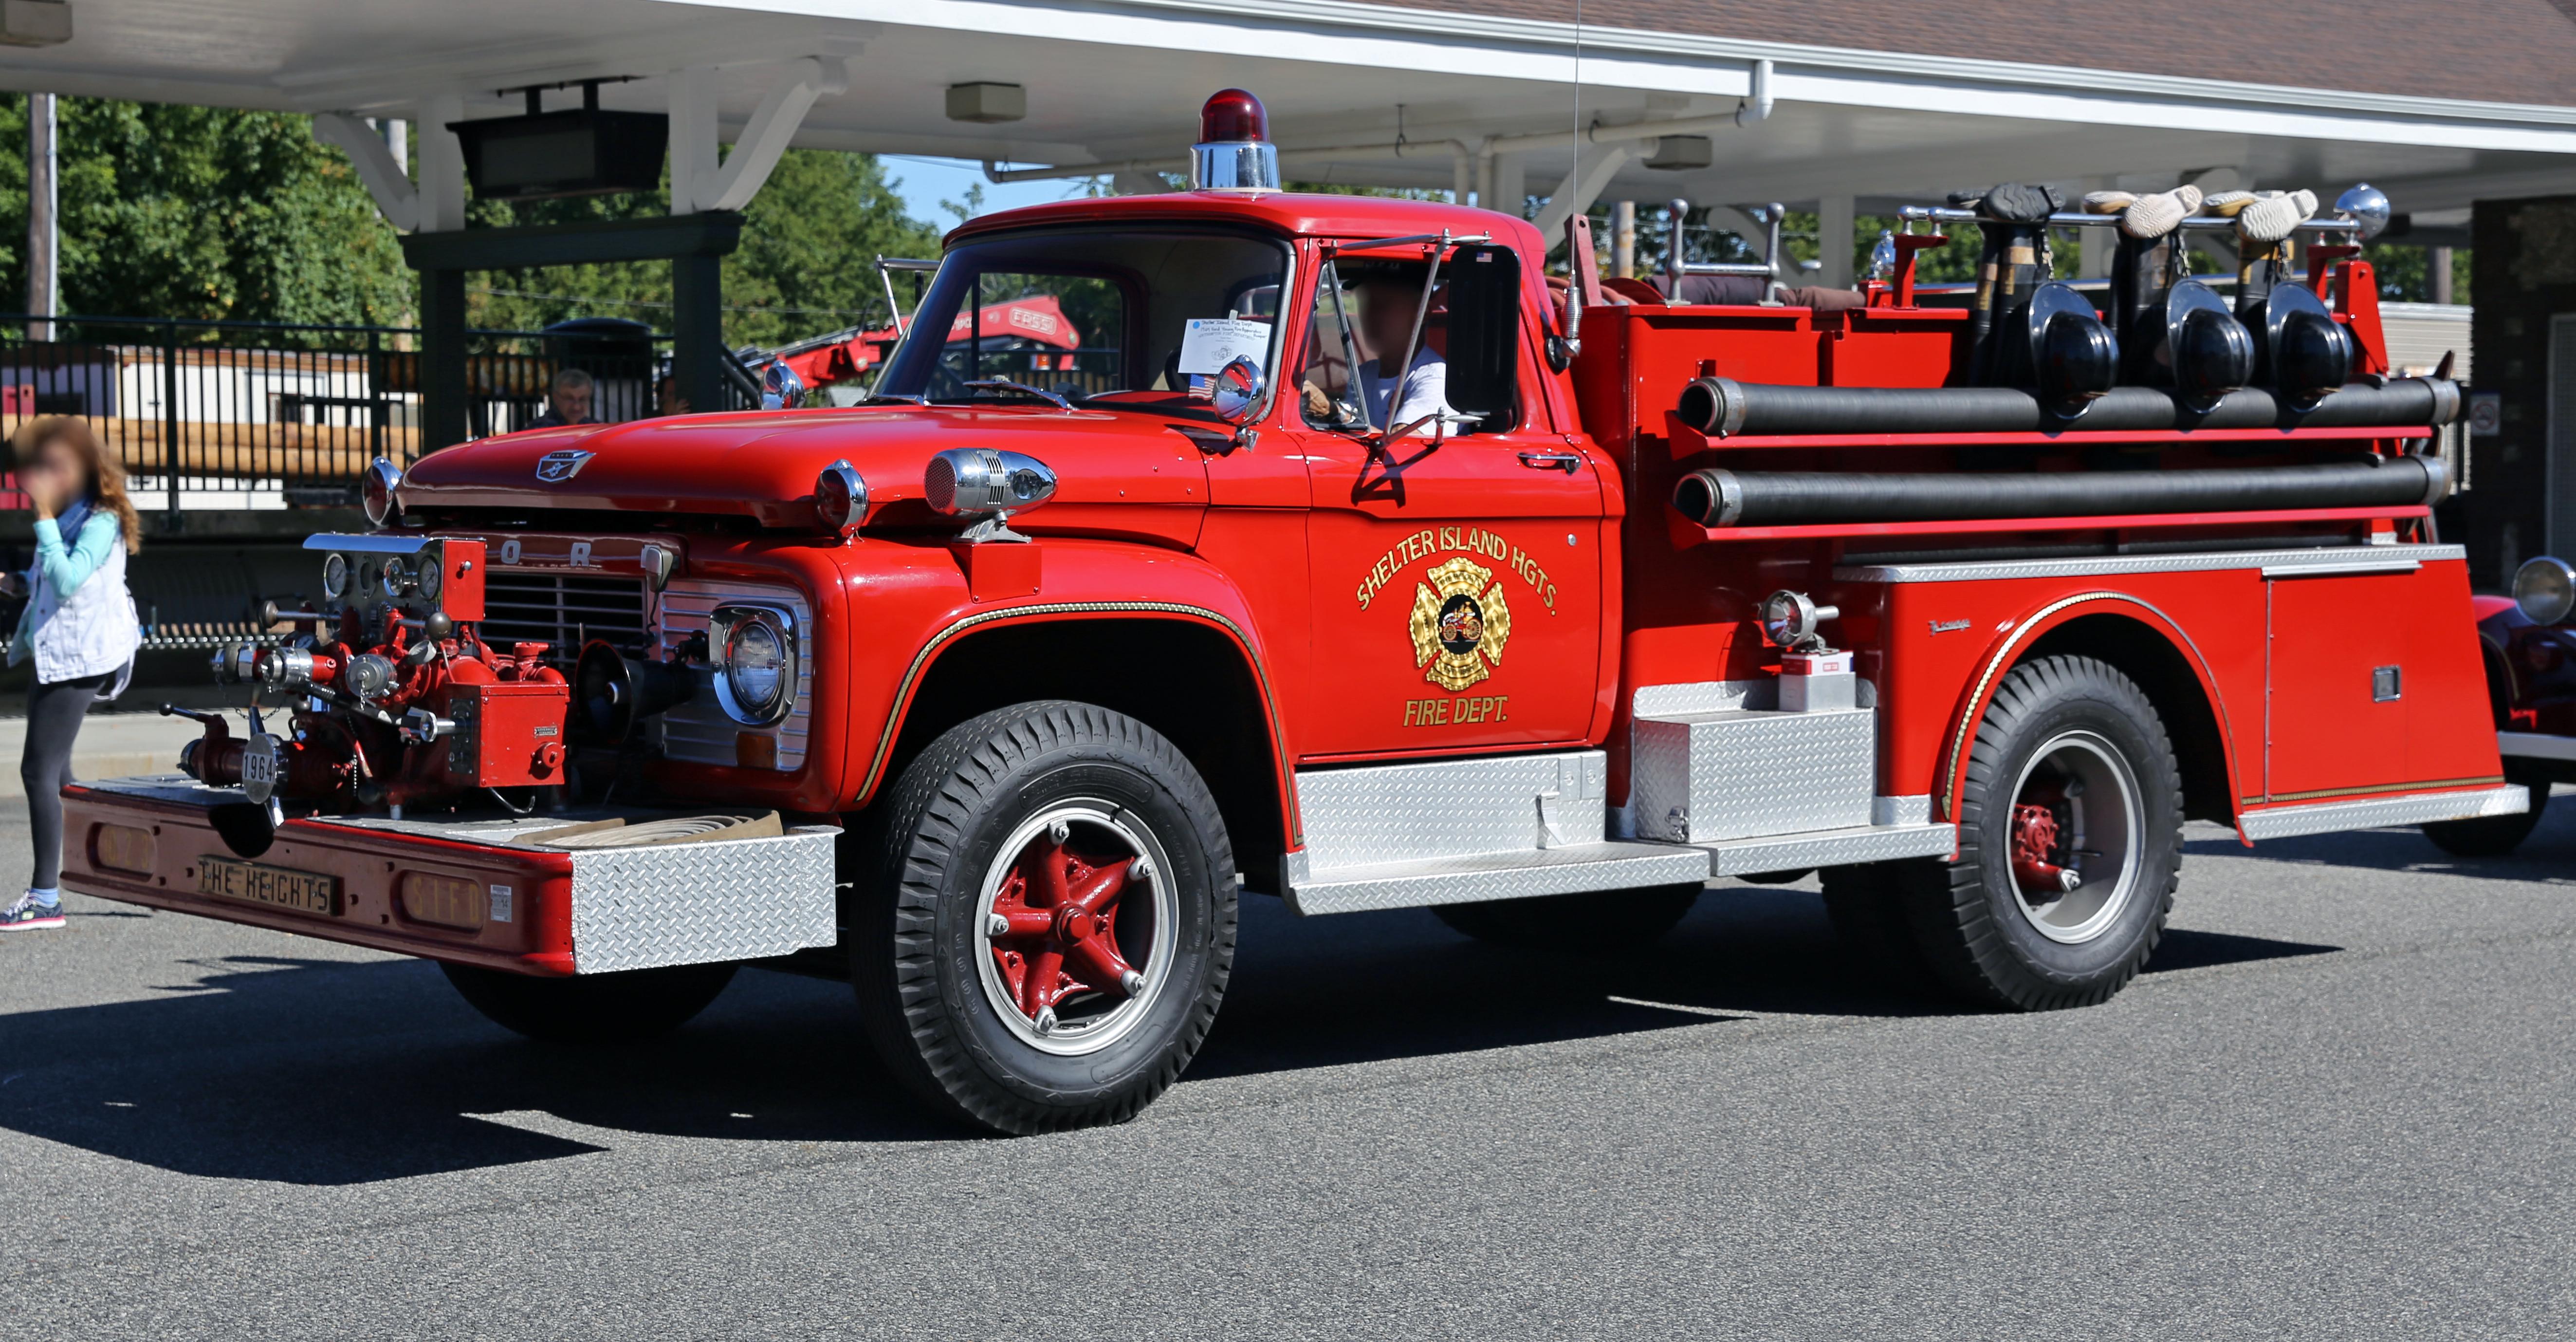 Description 1964 Ford F-series fire truck SIPD Heights.jpg